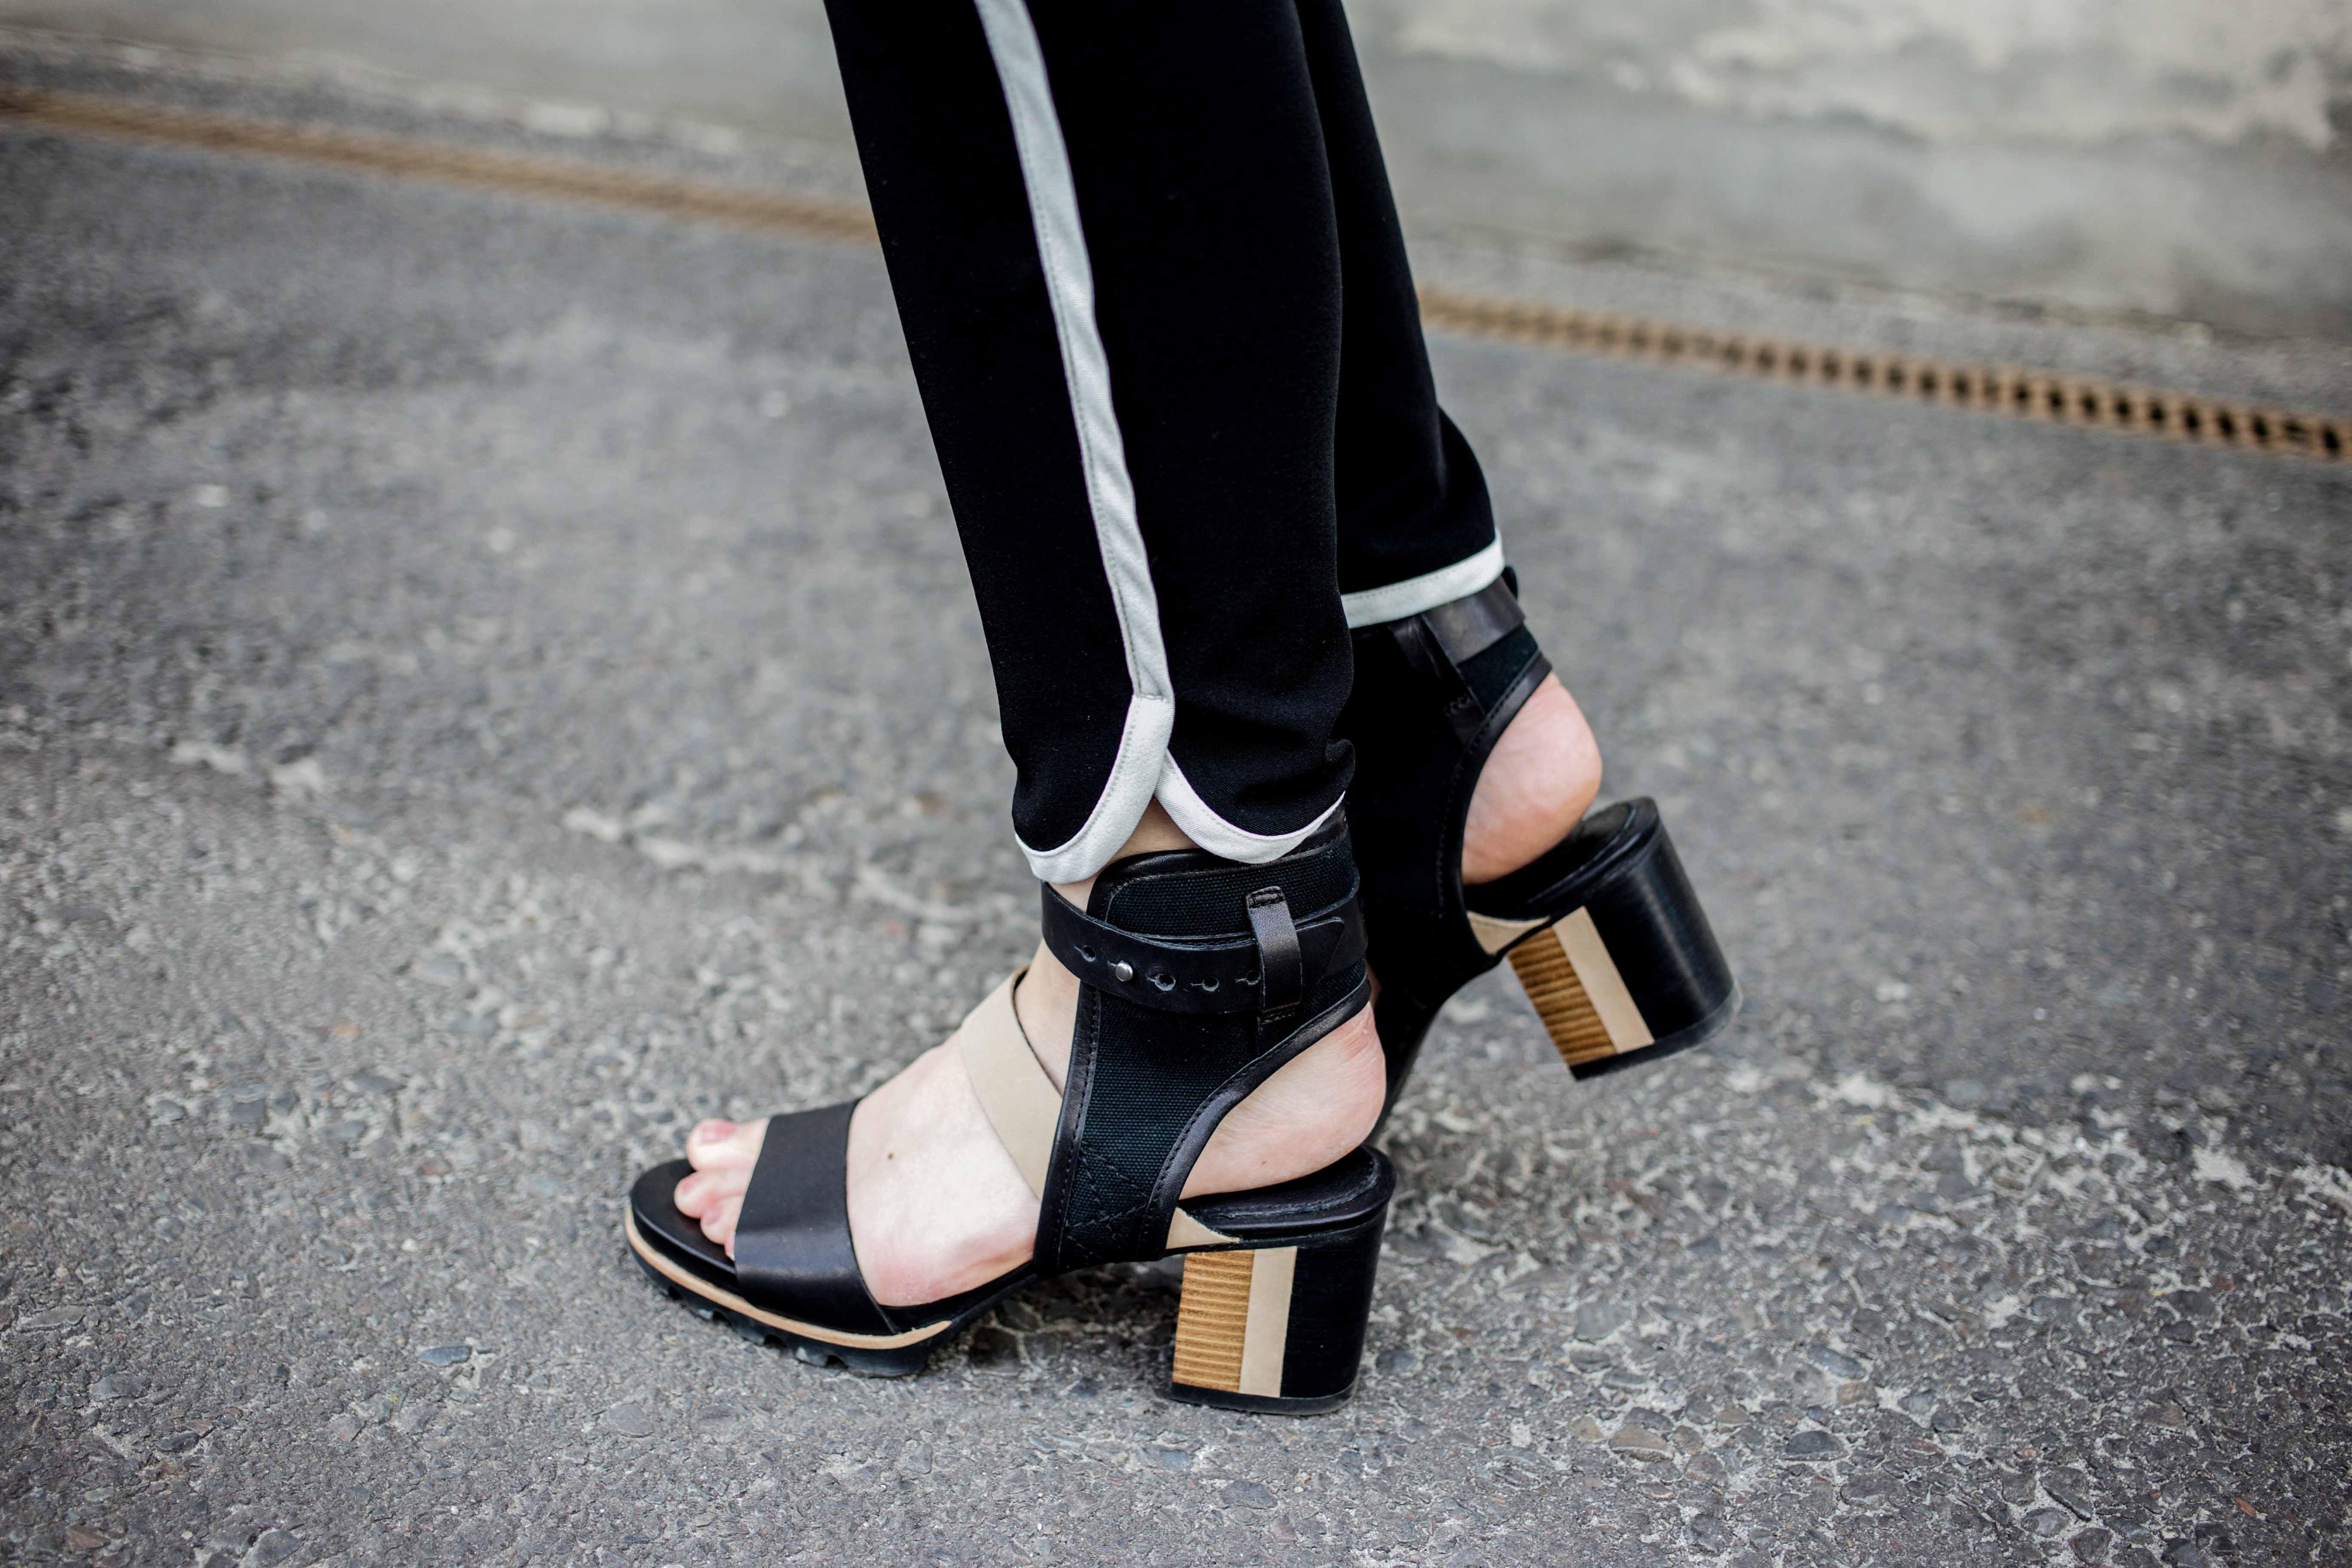 fashionweek-berlin-statement-gürtel-oversized-bluse-outfit-modeblog_6384